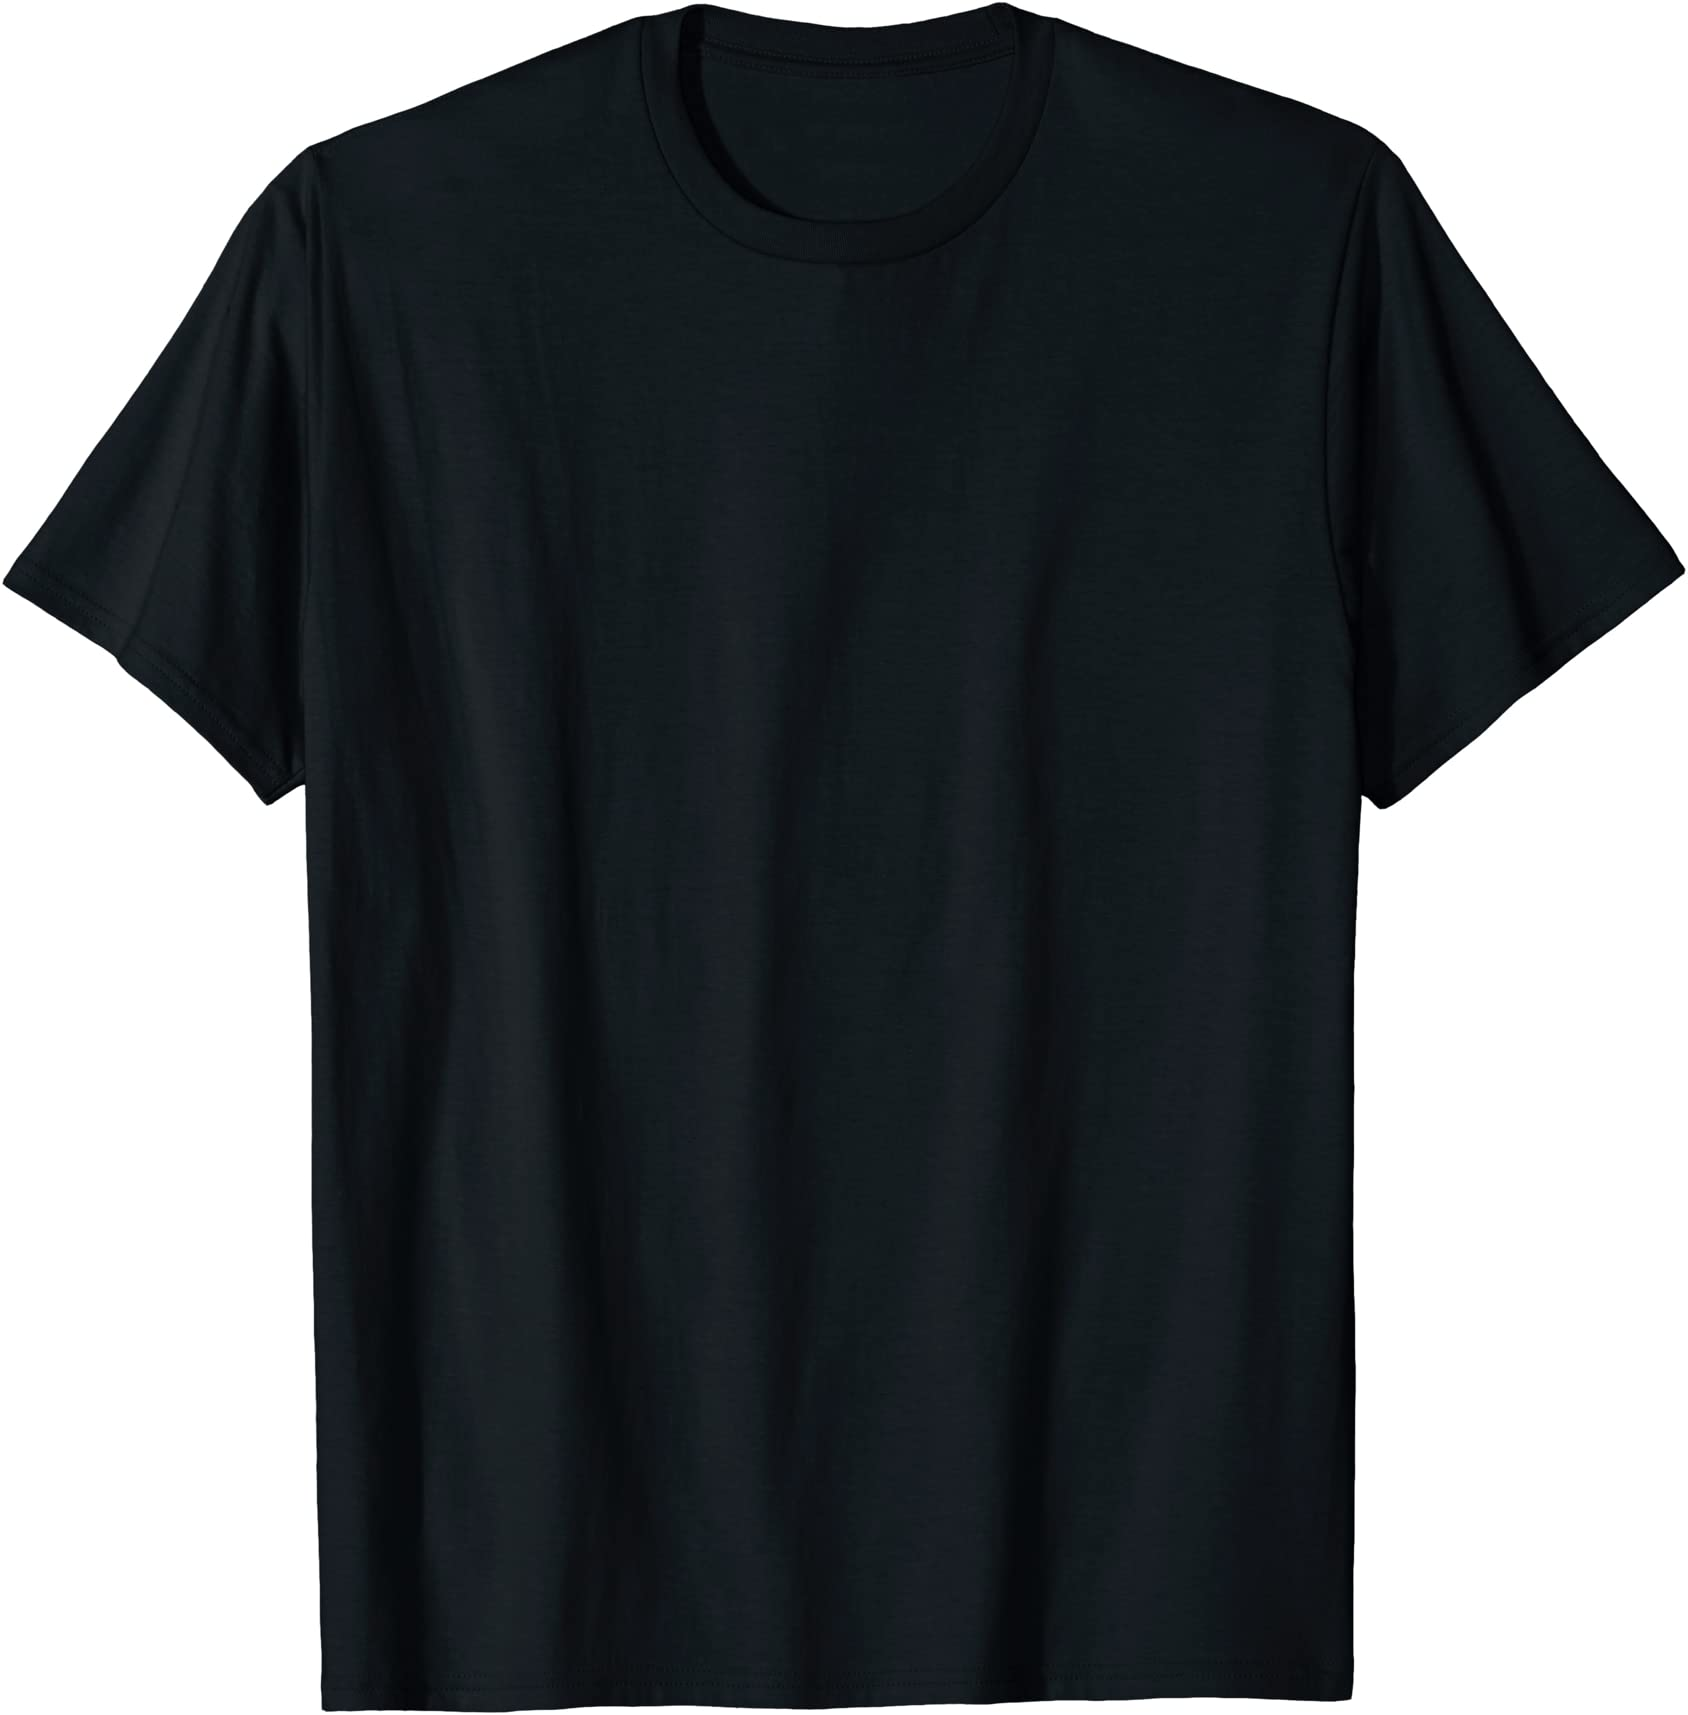 ST Patrick/'s Day T-Shirt ST Paddy/'s Irish Ireland Day Gift Adult /& Kids Top